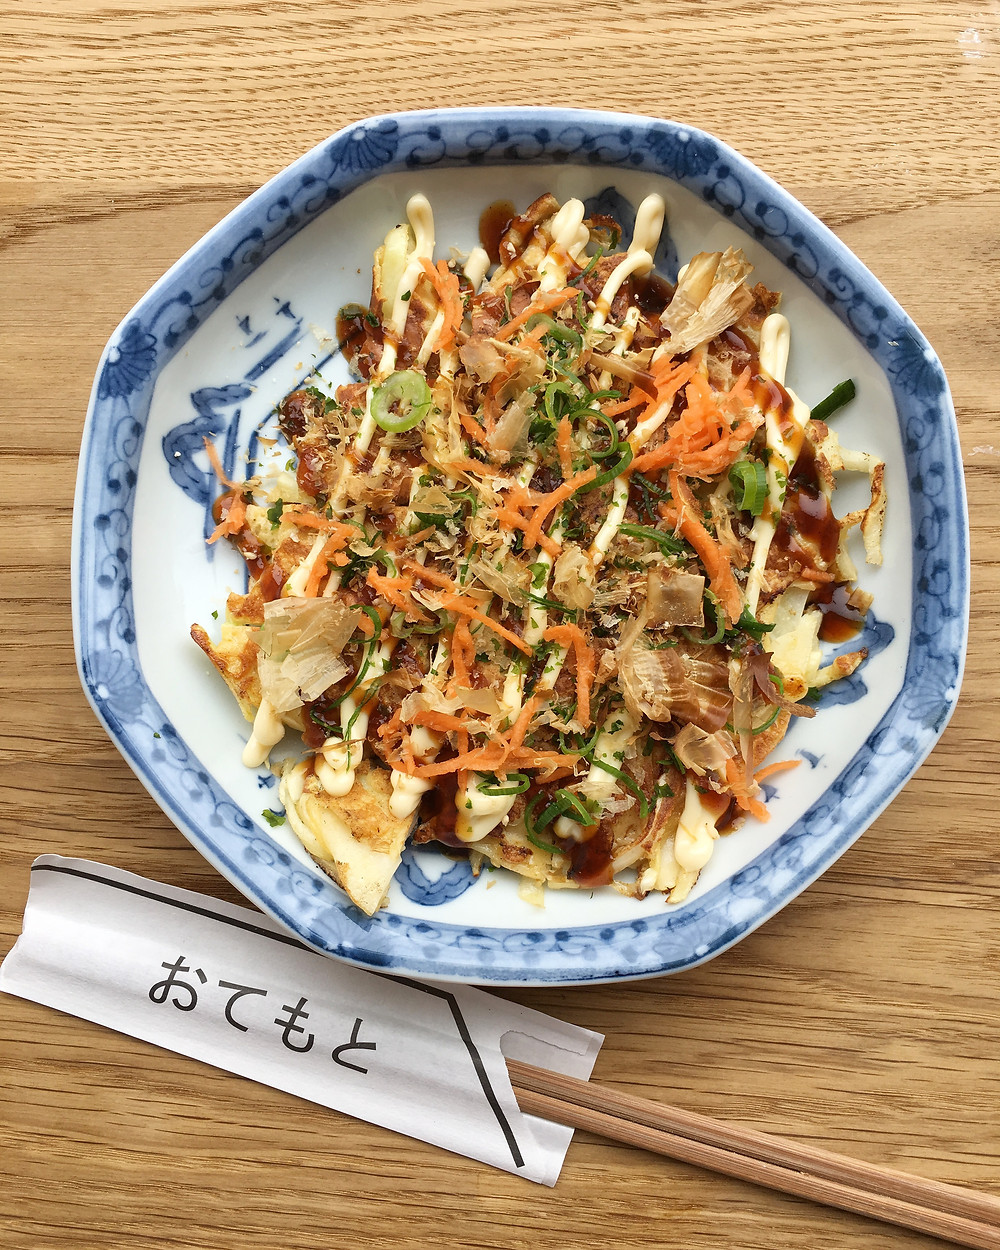 Chicken Okonomiyaki - 50 DKK